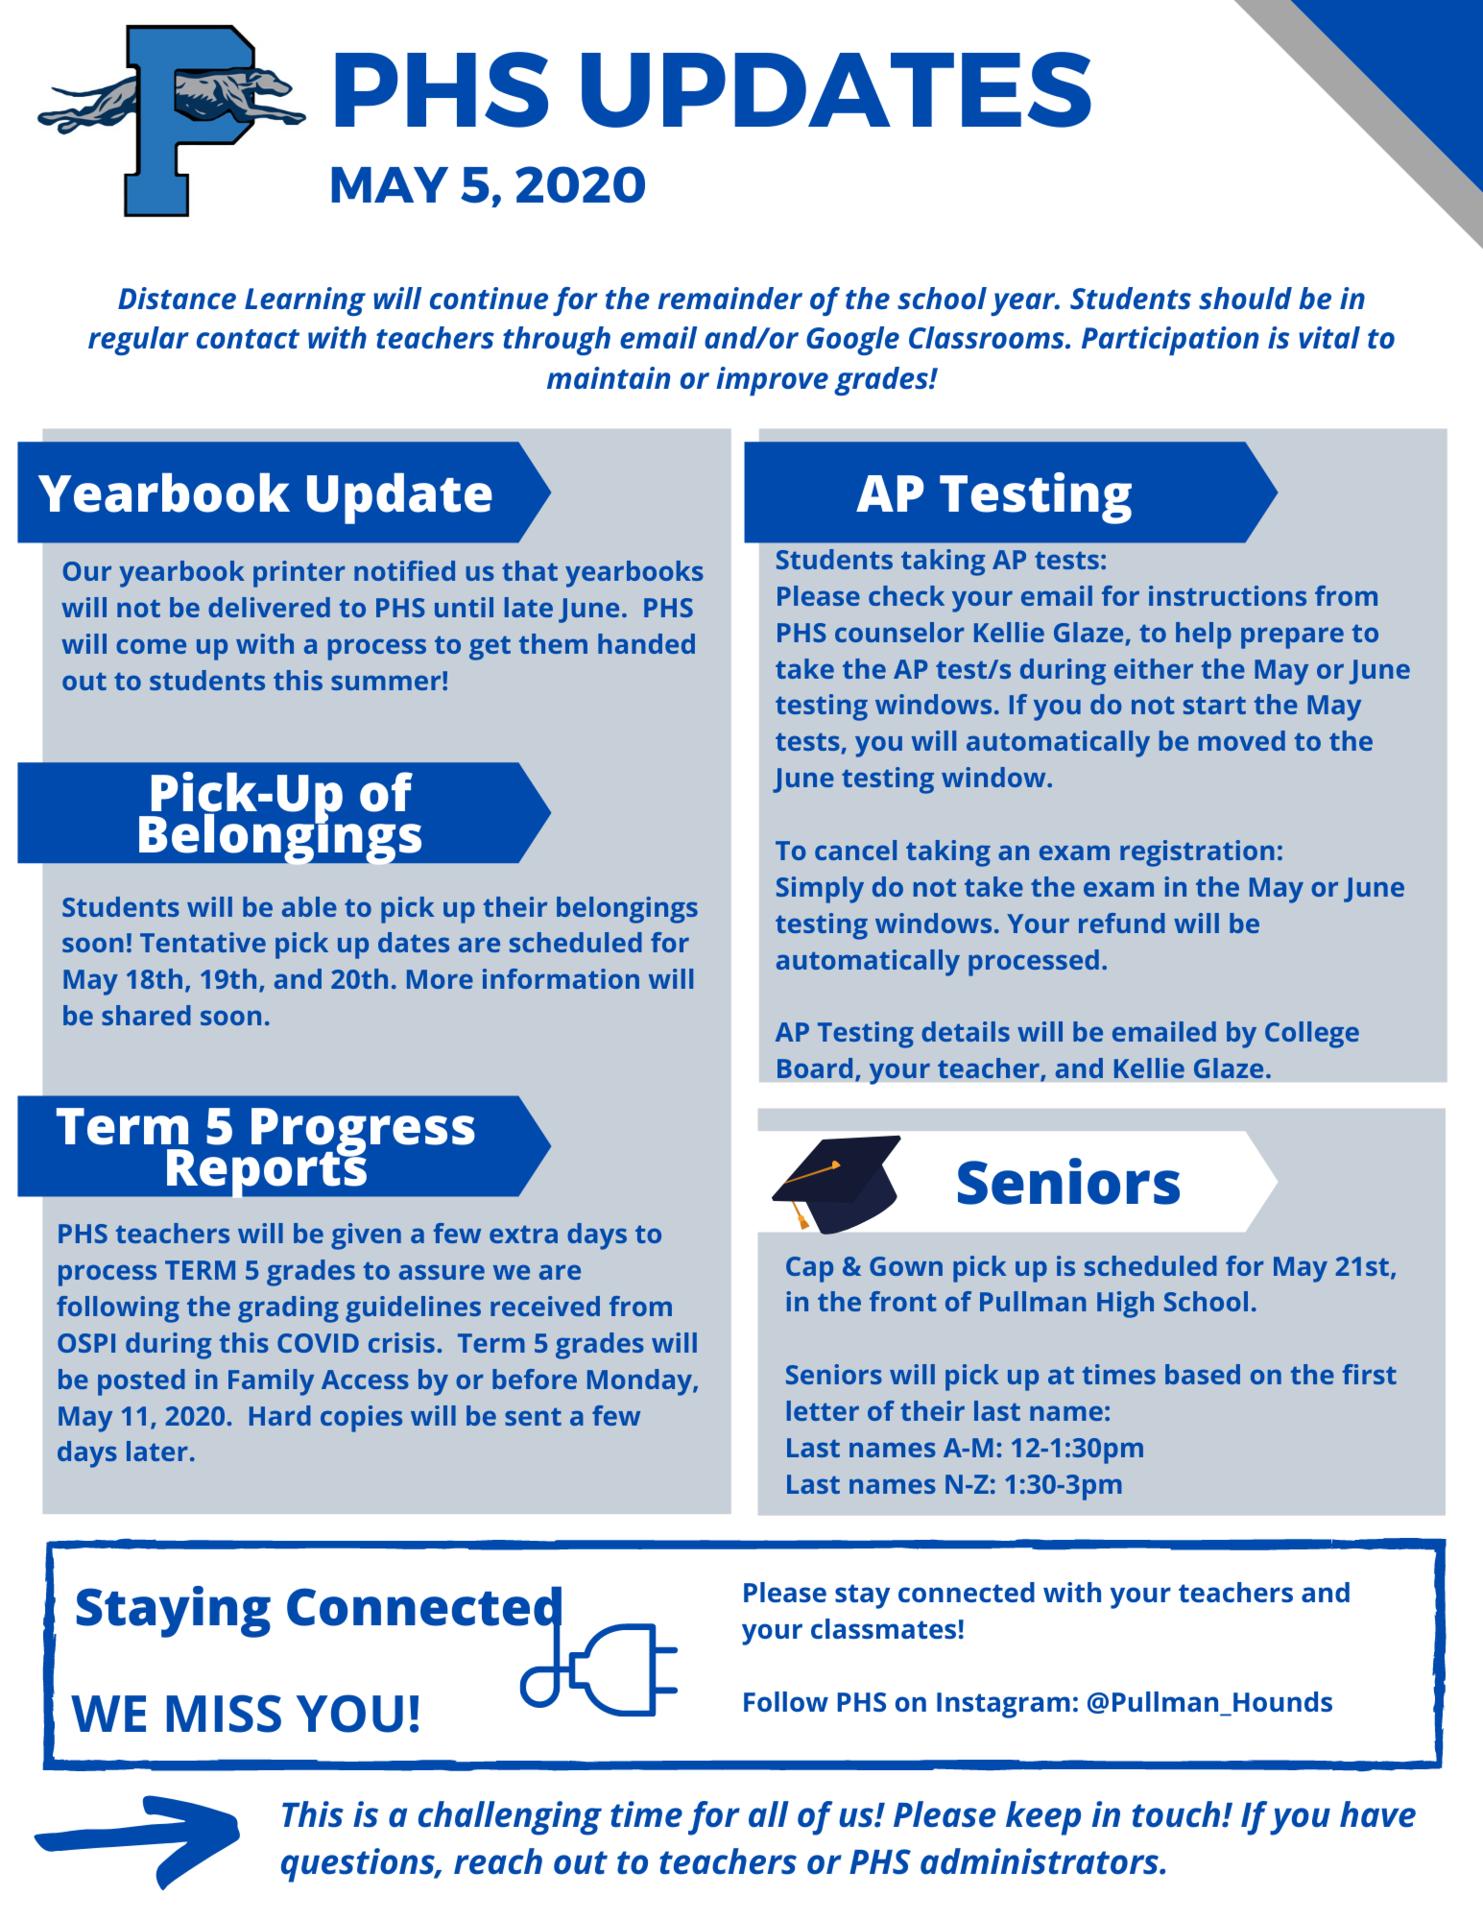 PHS Update May 6